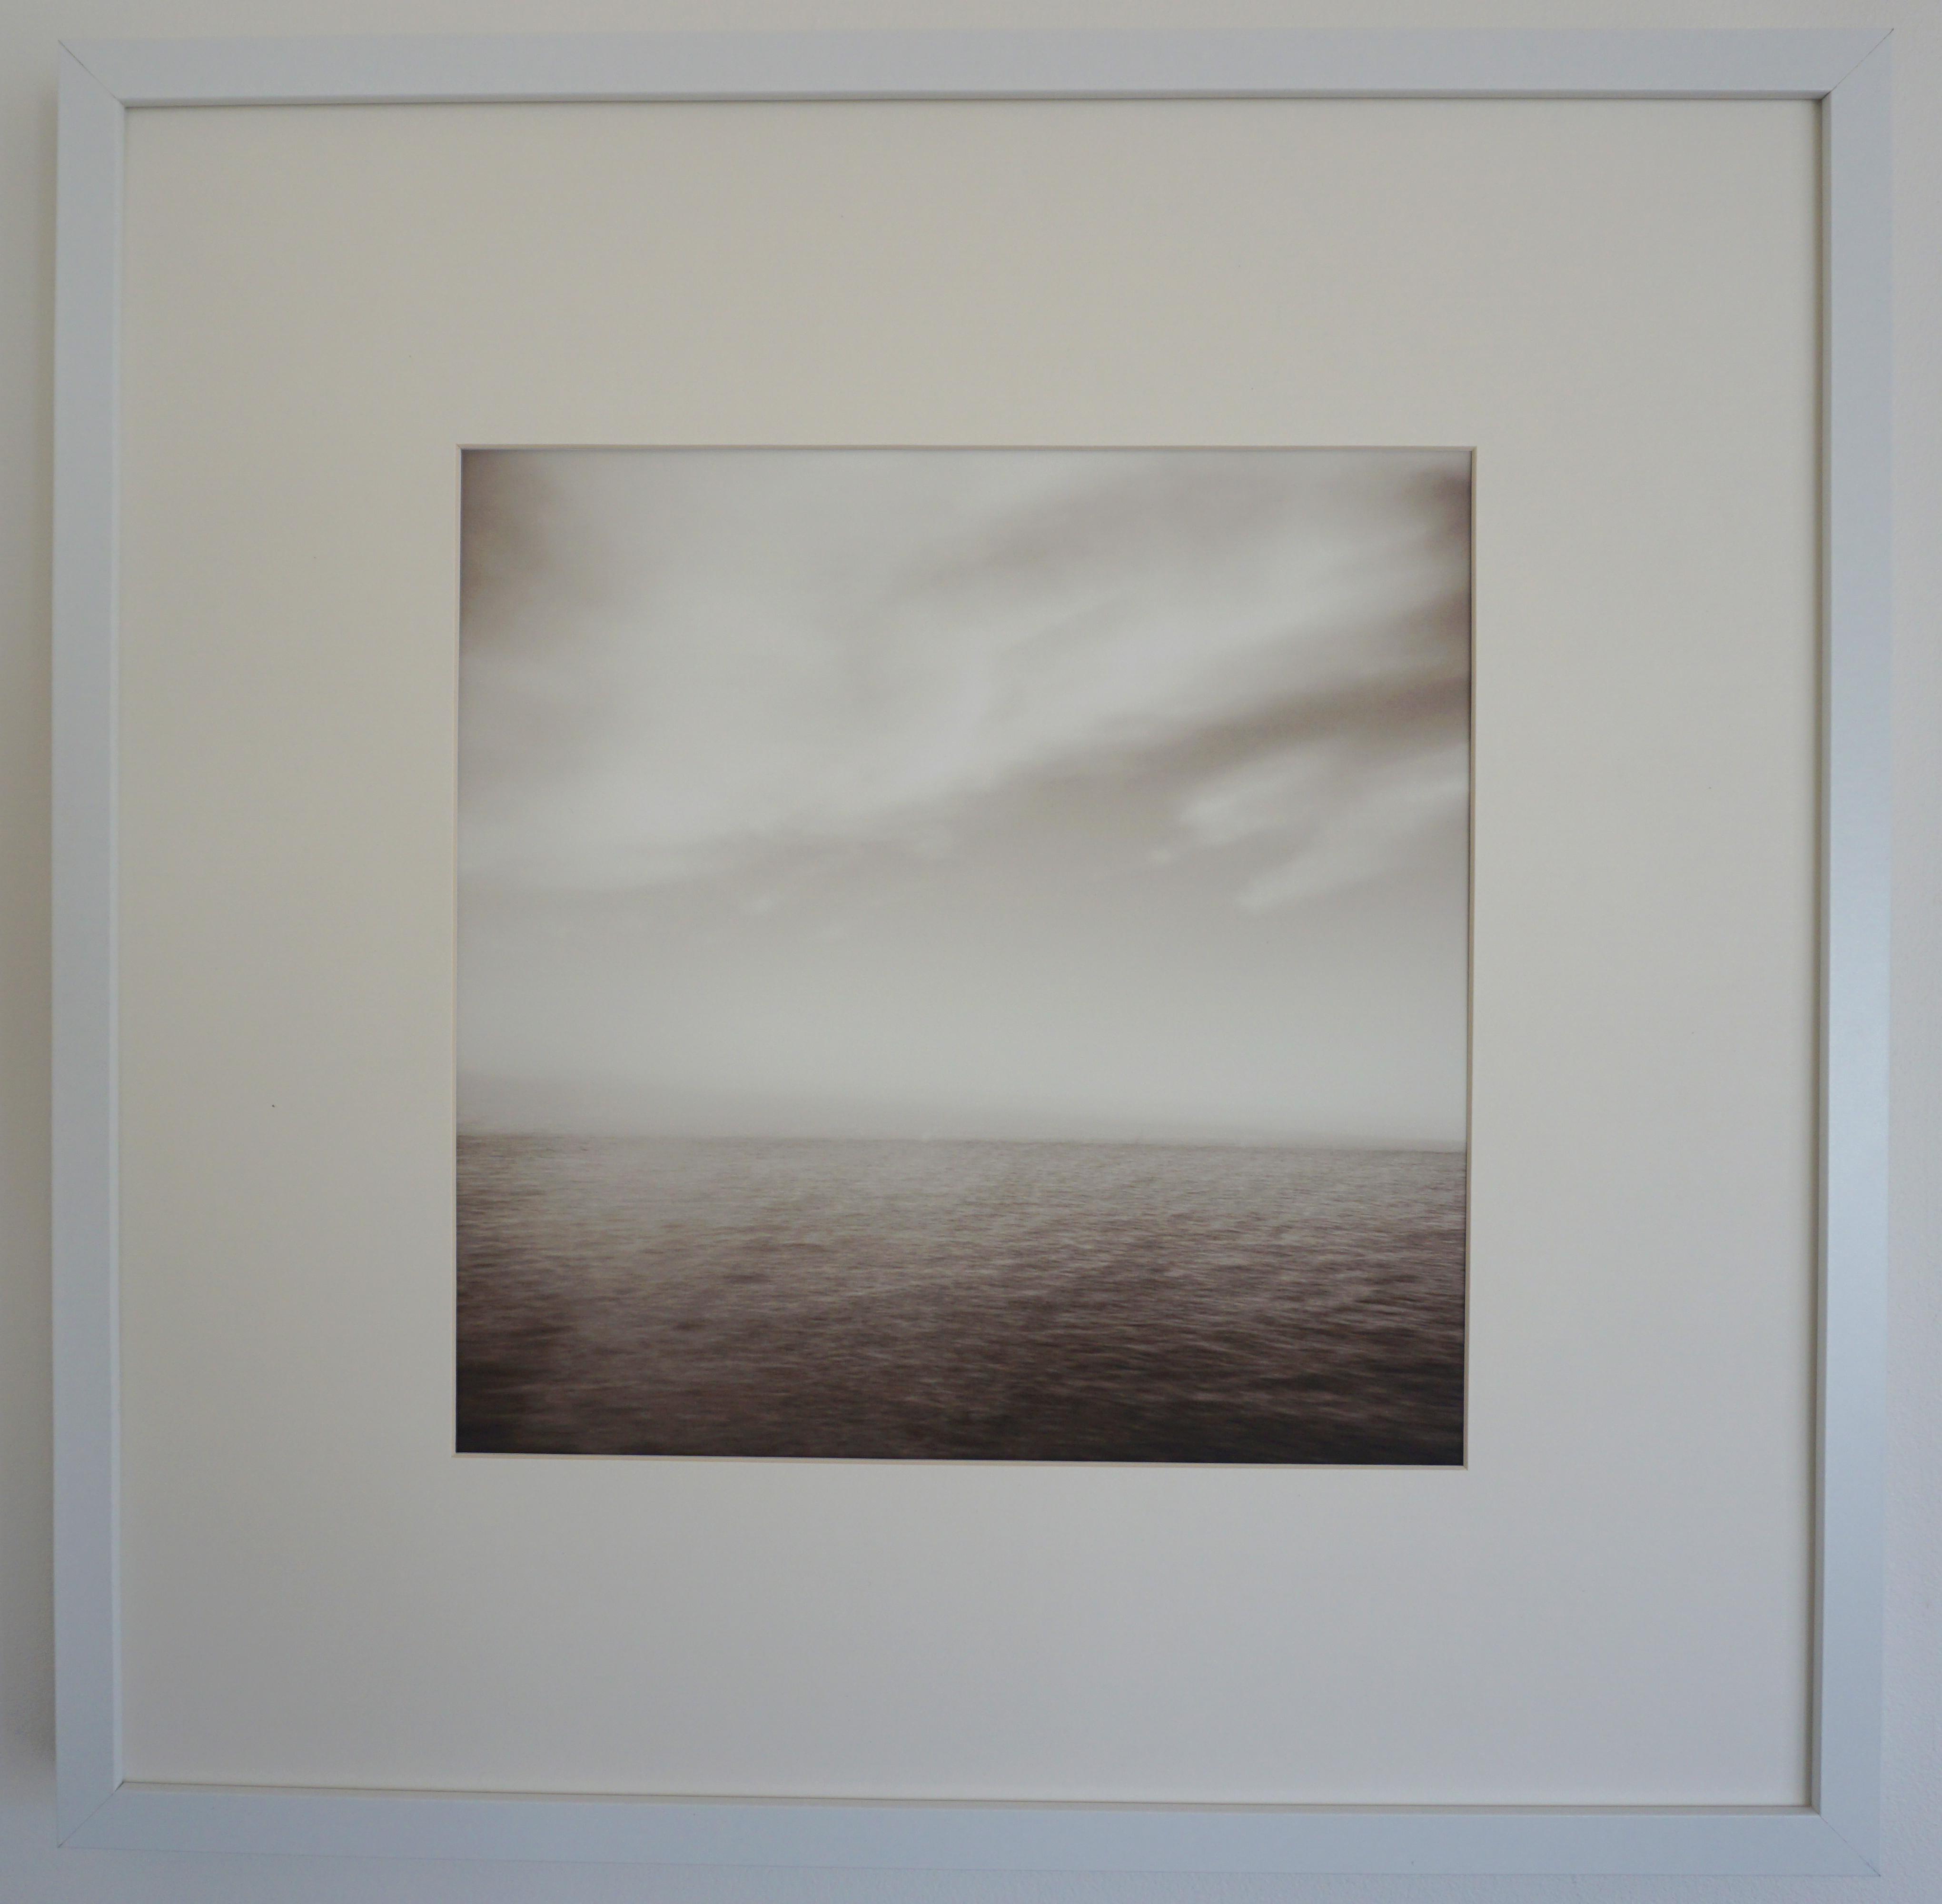 'Emptiness' ©2015  Sarah Bell